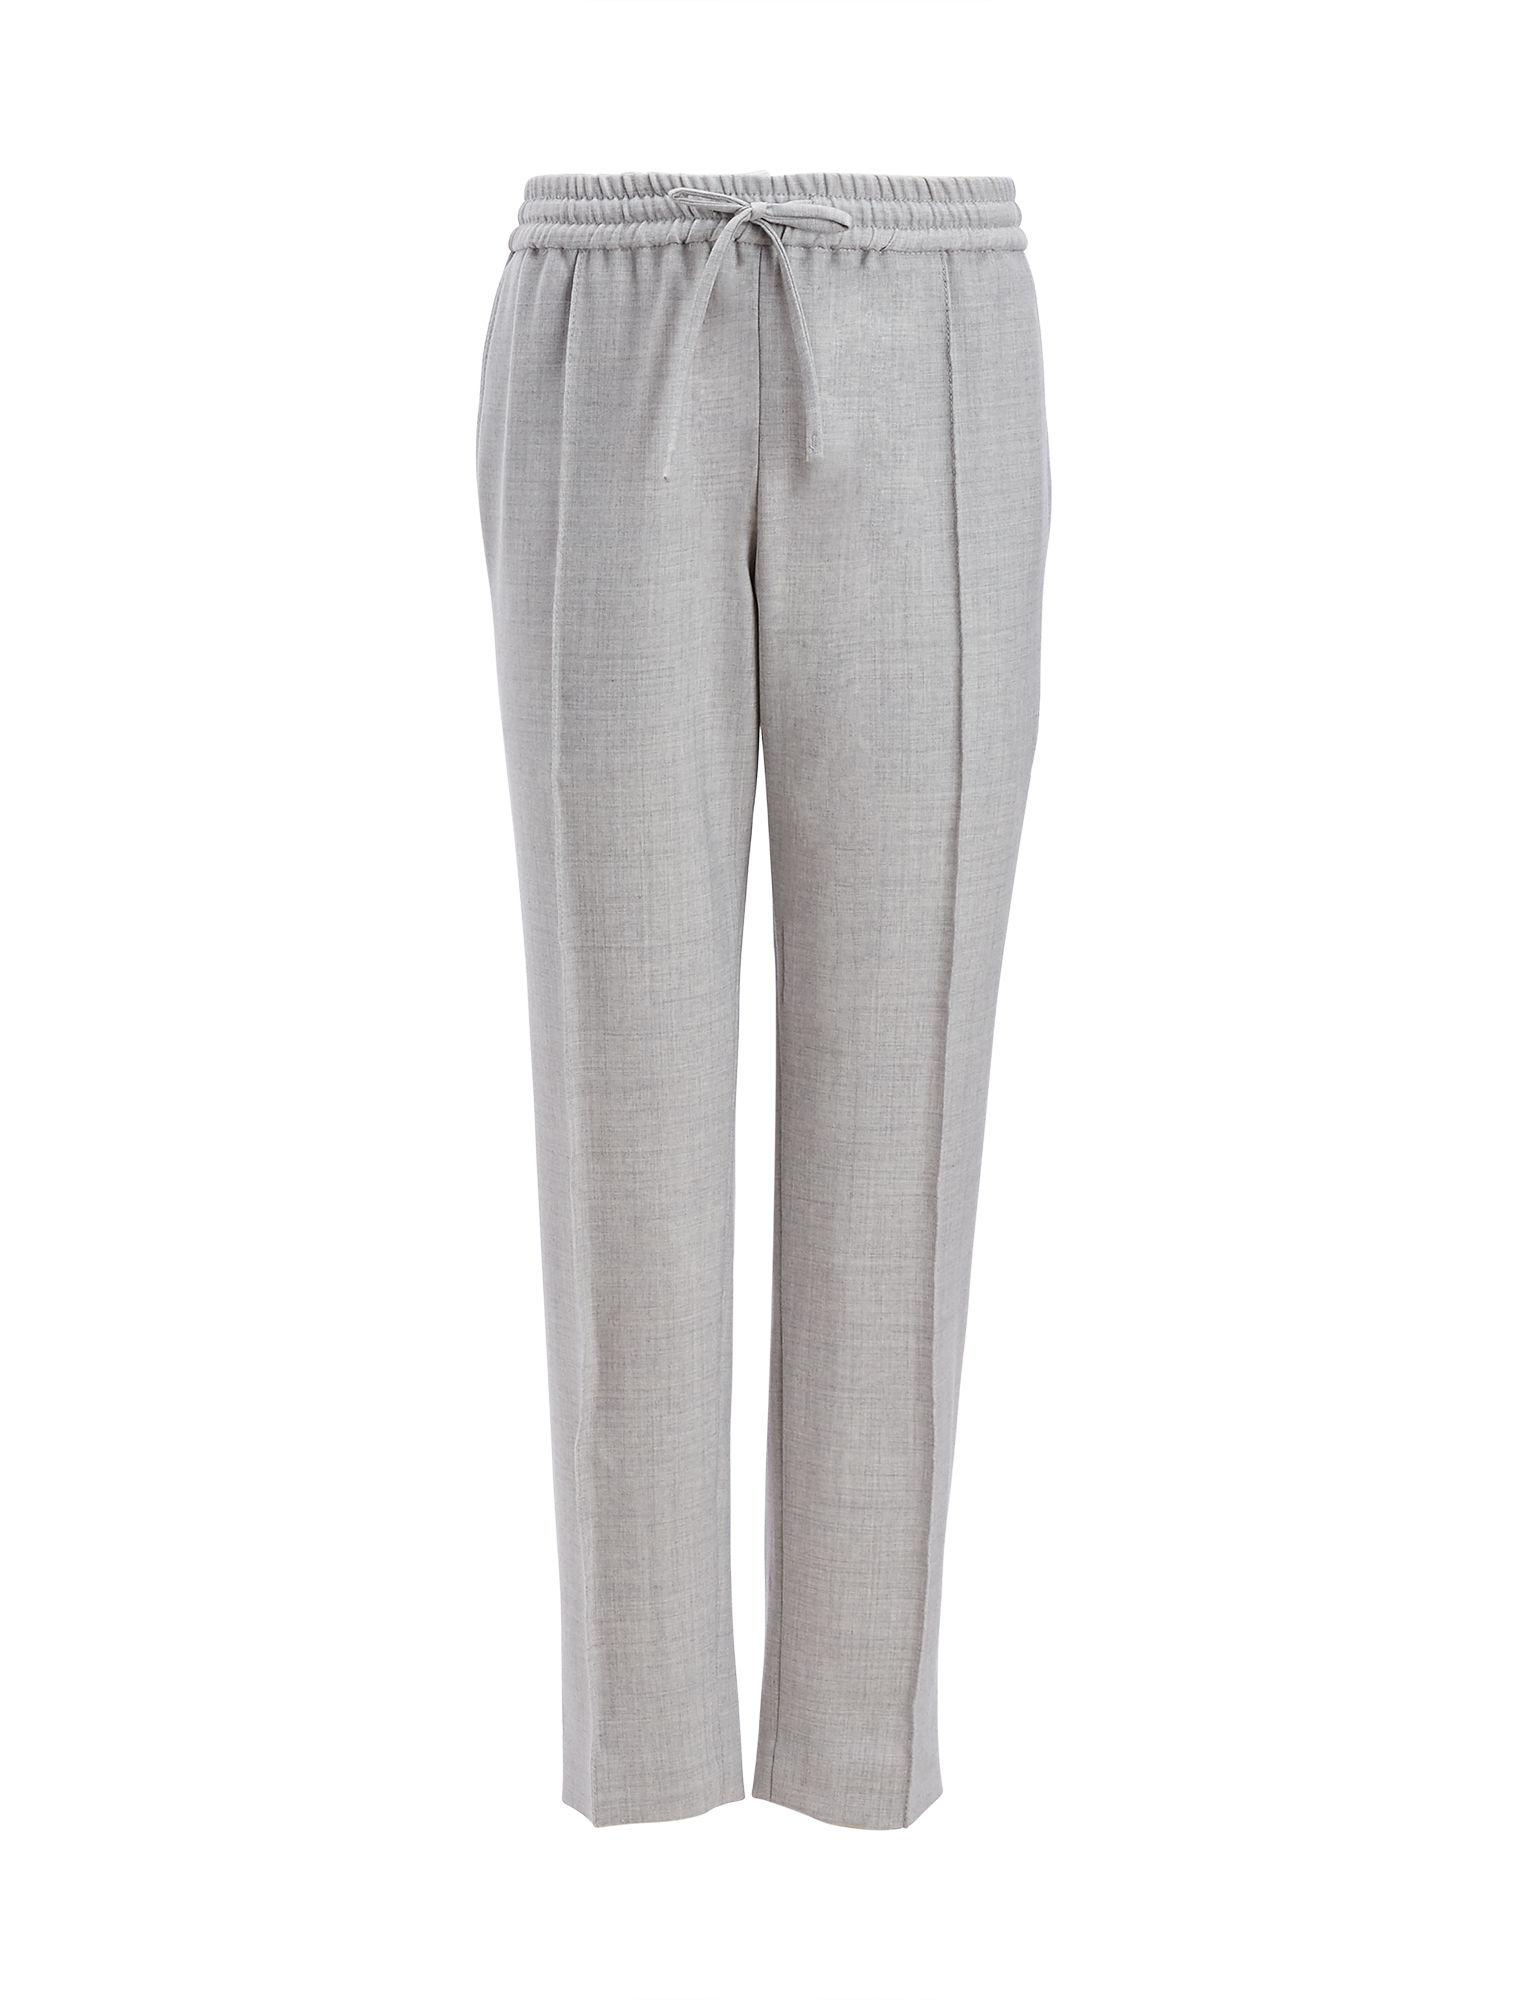 Zoom Comfort Wool-Blend Slim Trousers Joseph Cheap Sale Ebay Bwif6iUuP